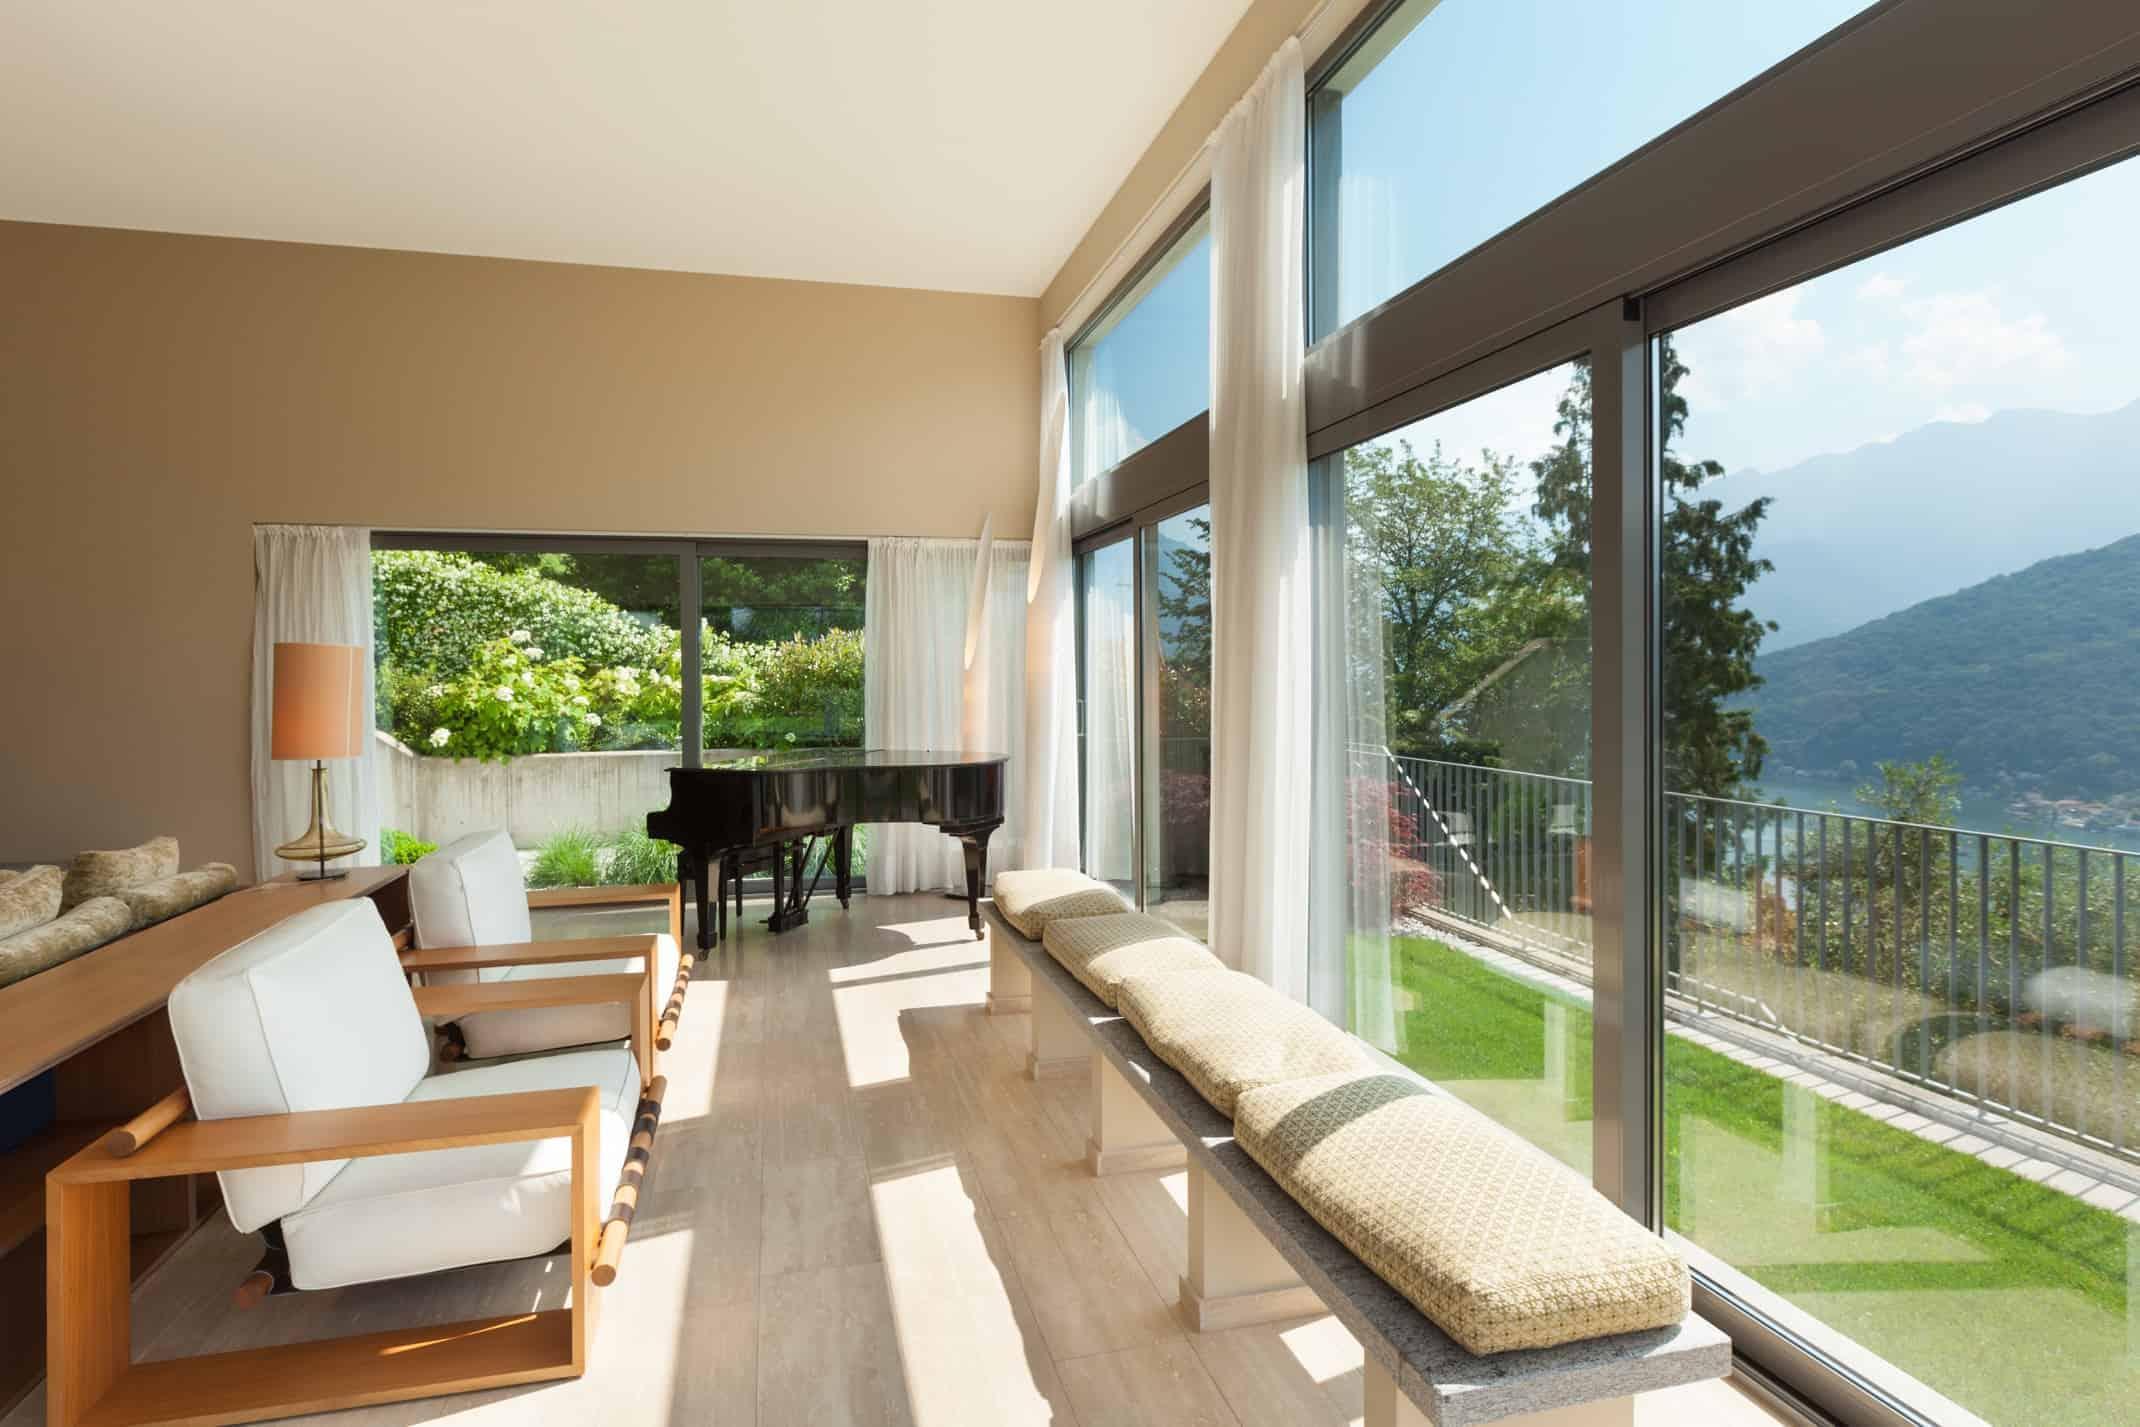 Real Estate Photo - Get Natural Looking Real Estate Photos